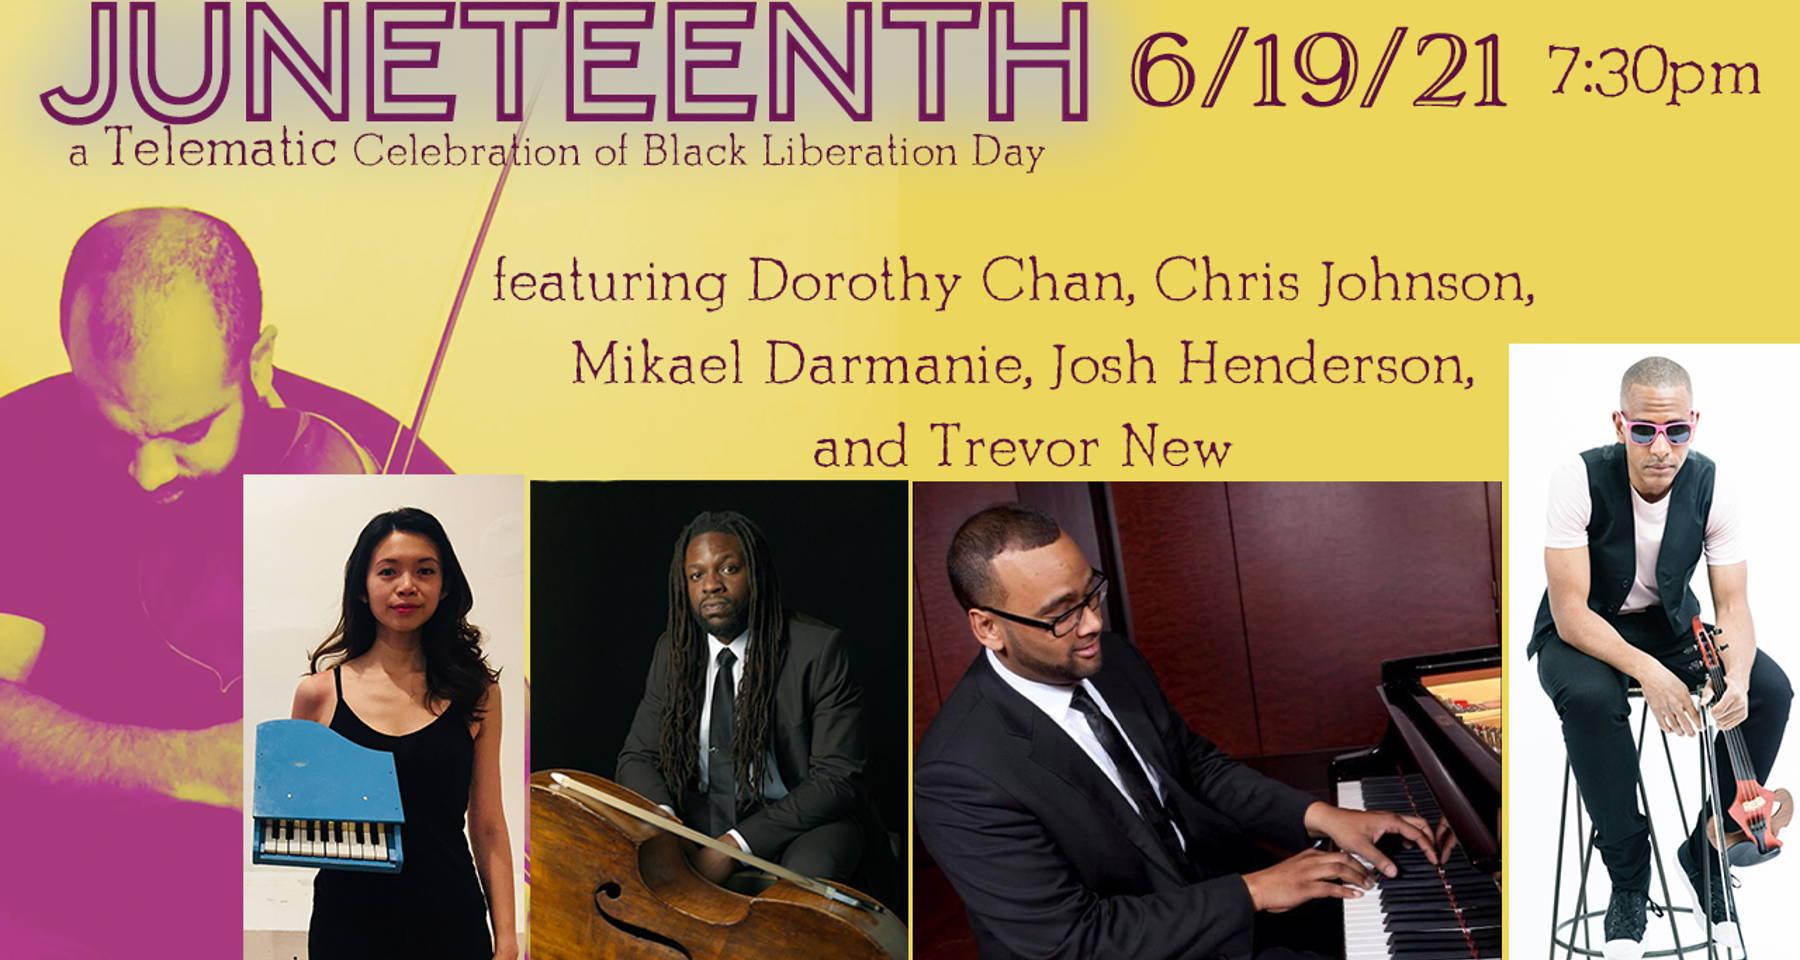 Juneteenth Celebration - a telematic celebration of Black Liberation Day